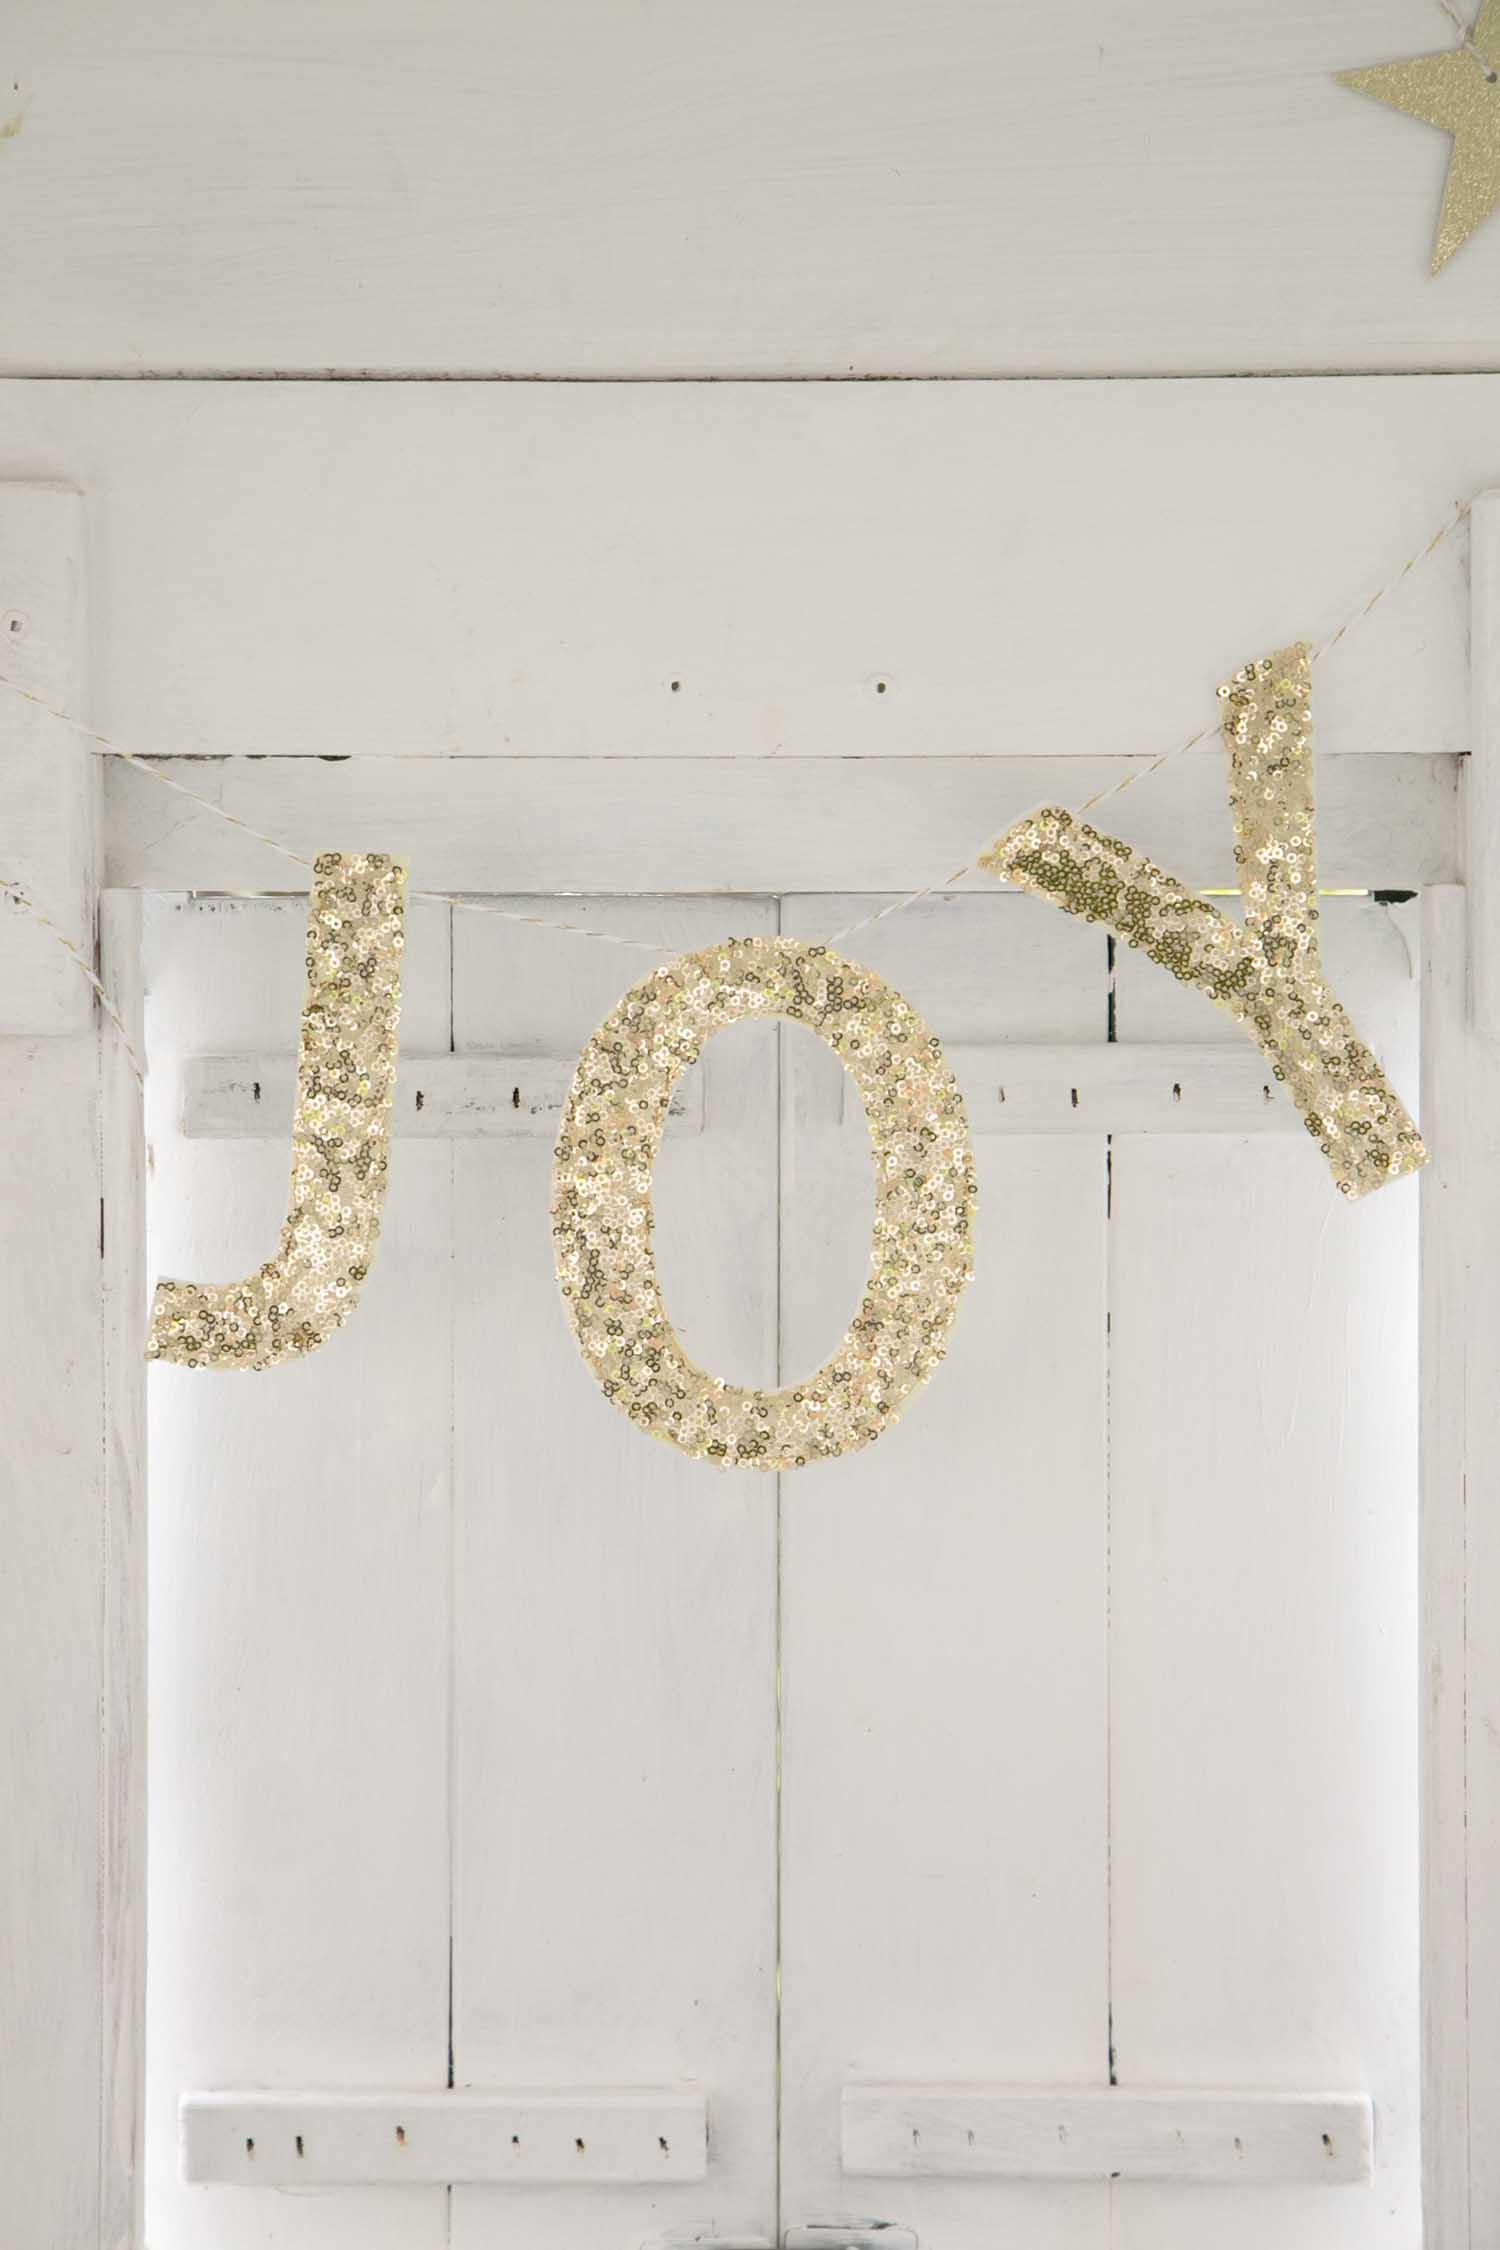 JOY garland